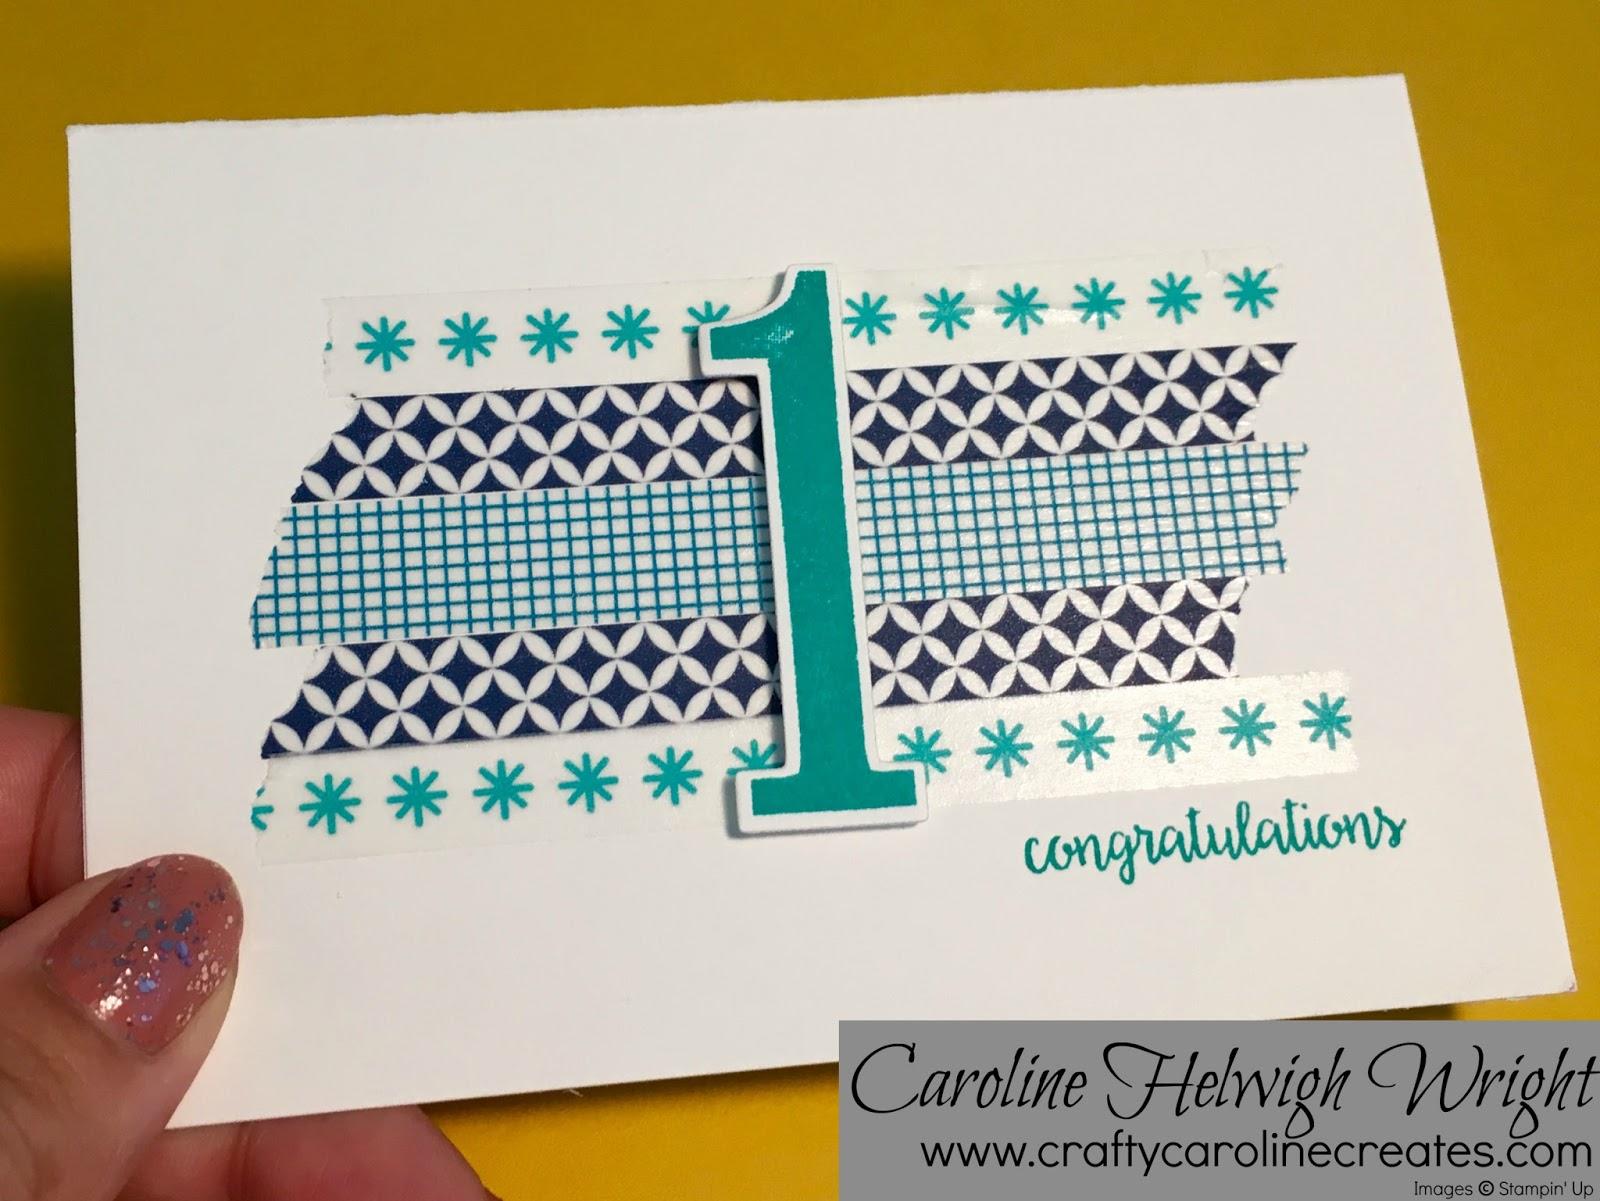 Craftycarolinecreates st anniversary congratulations washi tape